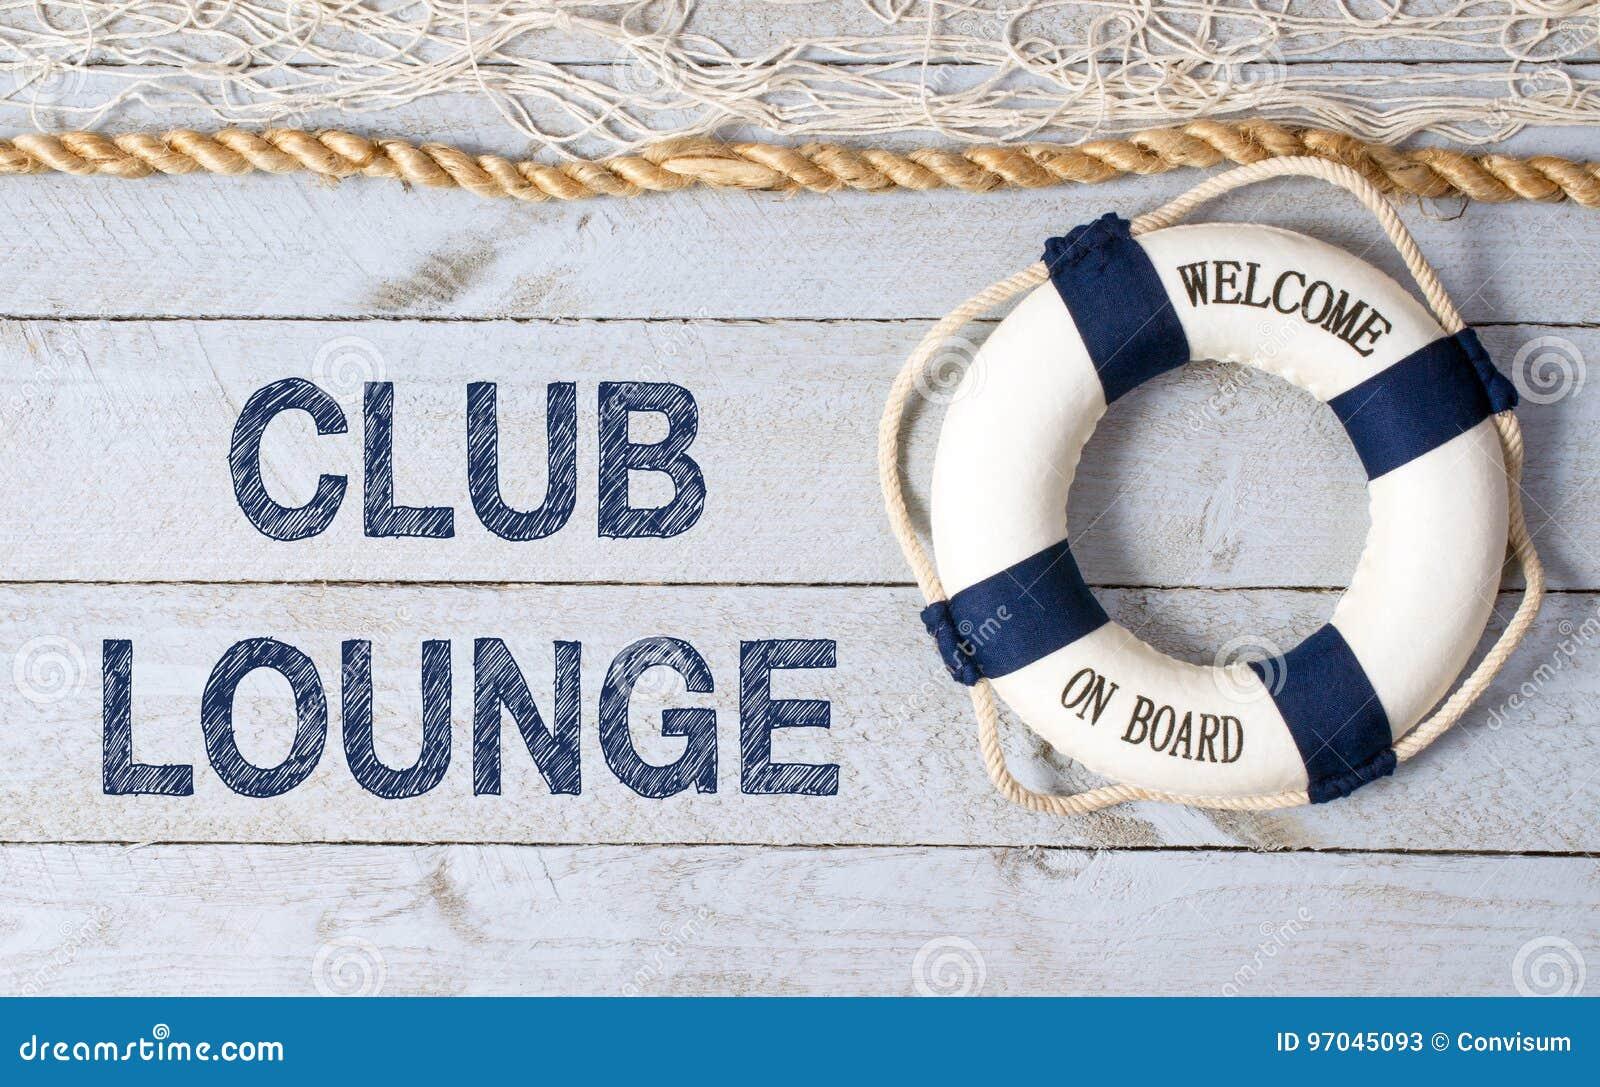 Klubbavardagsrum - välkomnande ombord